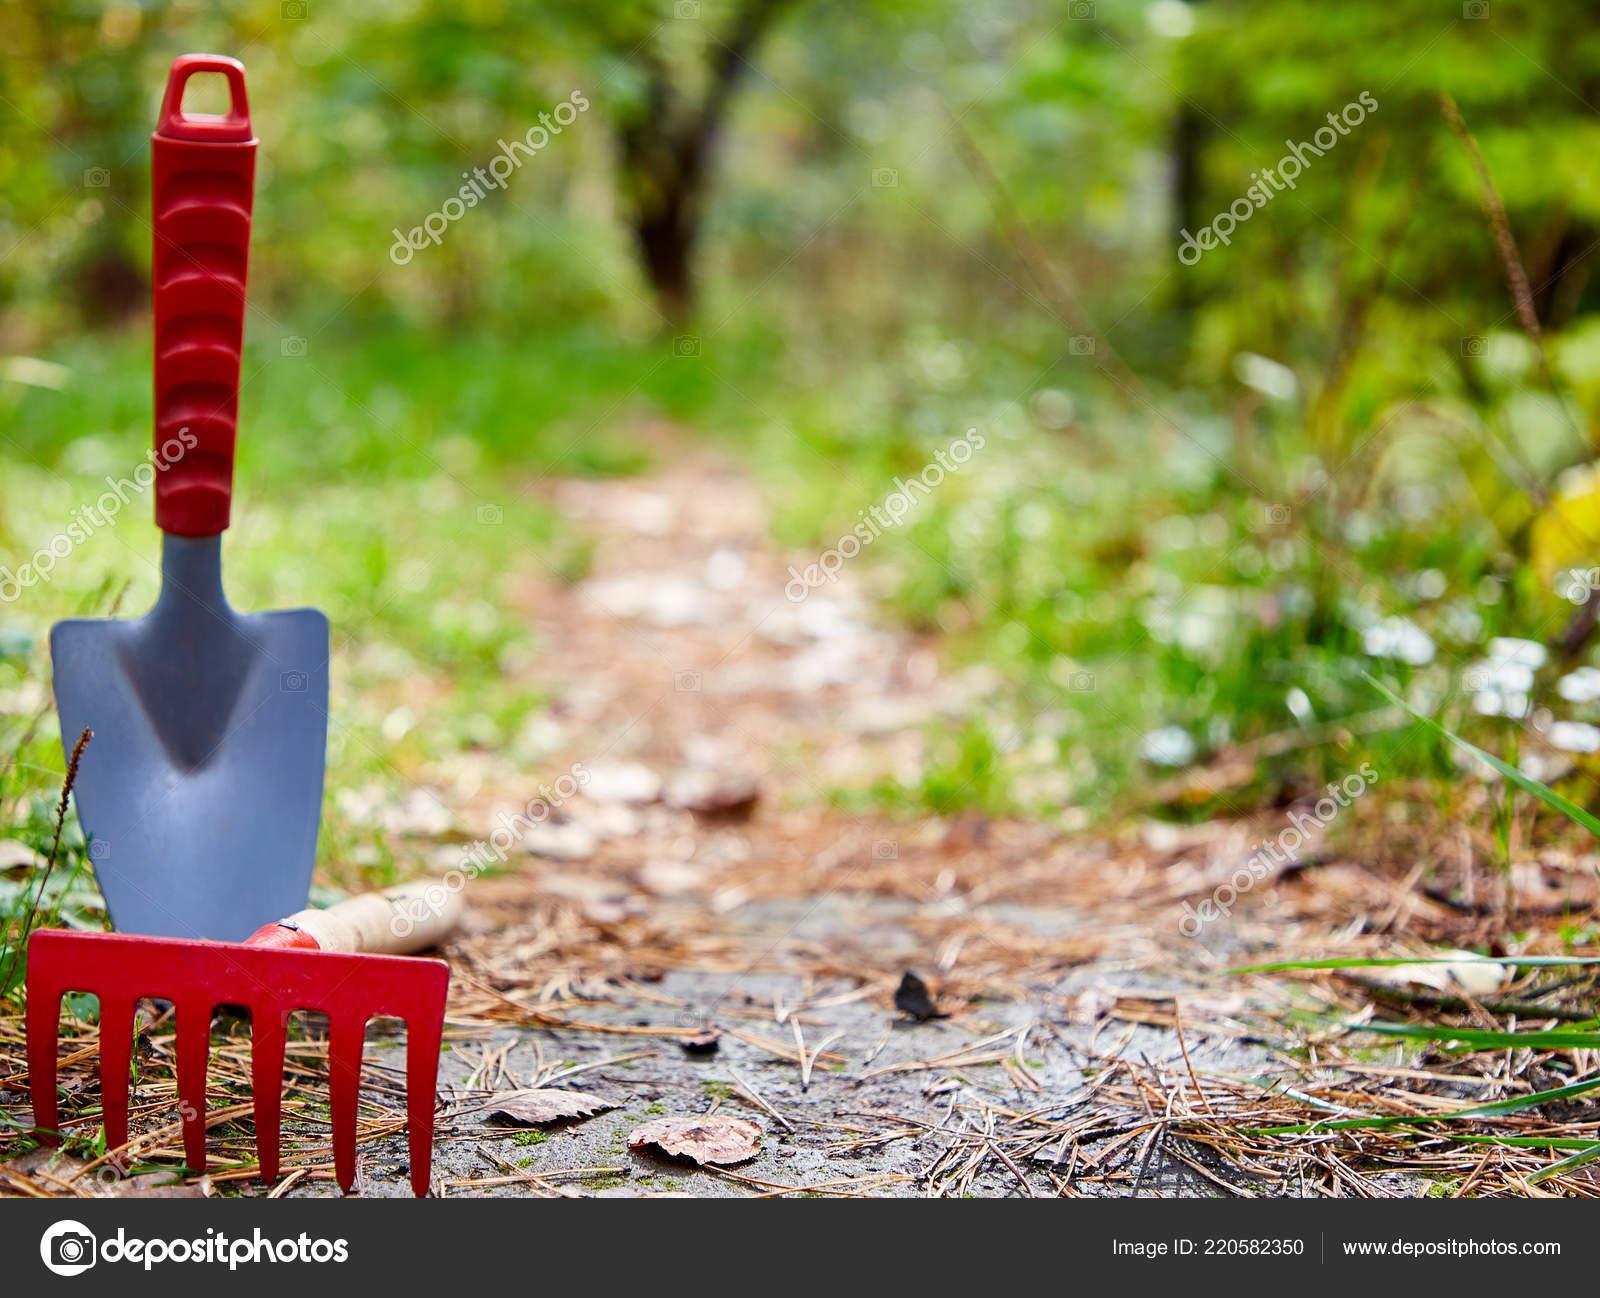 Fond, jardin, nettoyage, petite pelle, râteau, sur la gauche ...